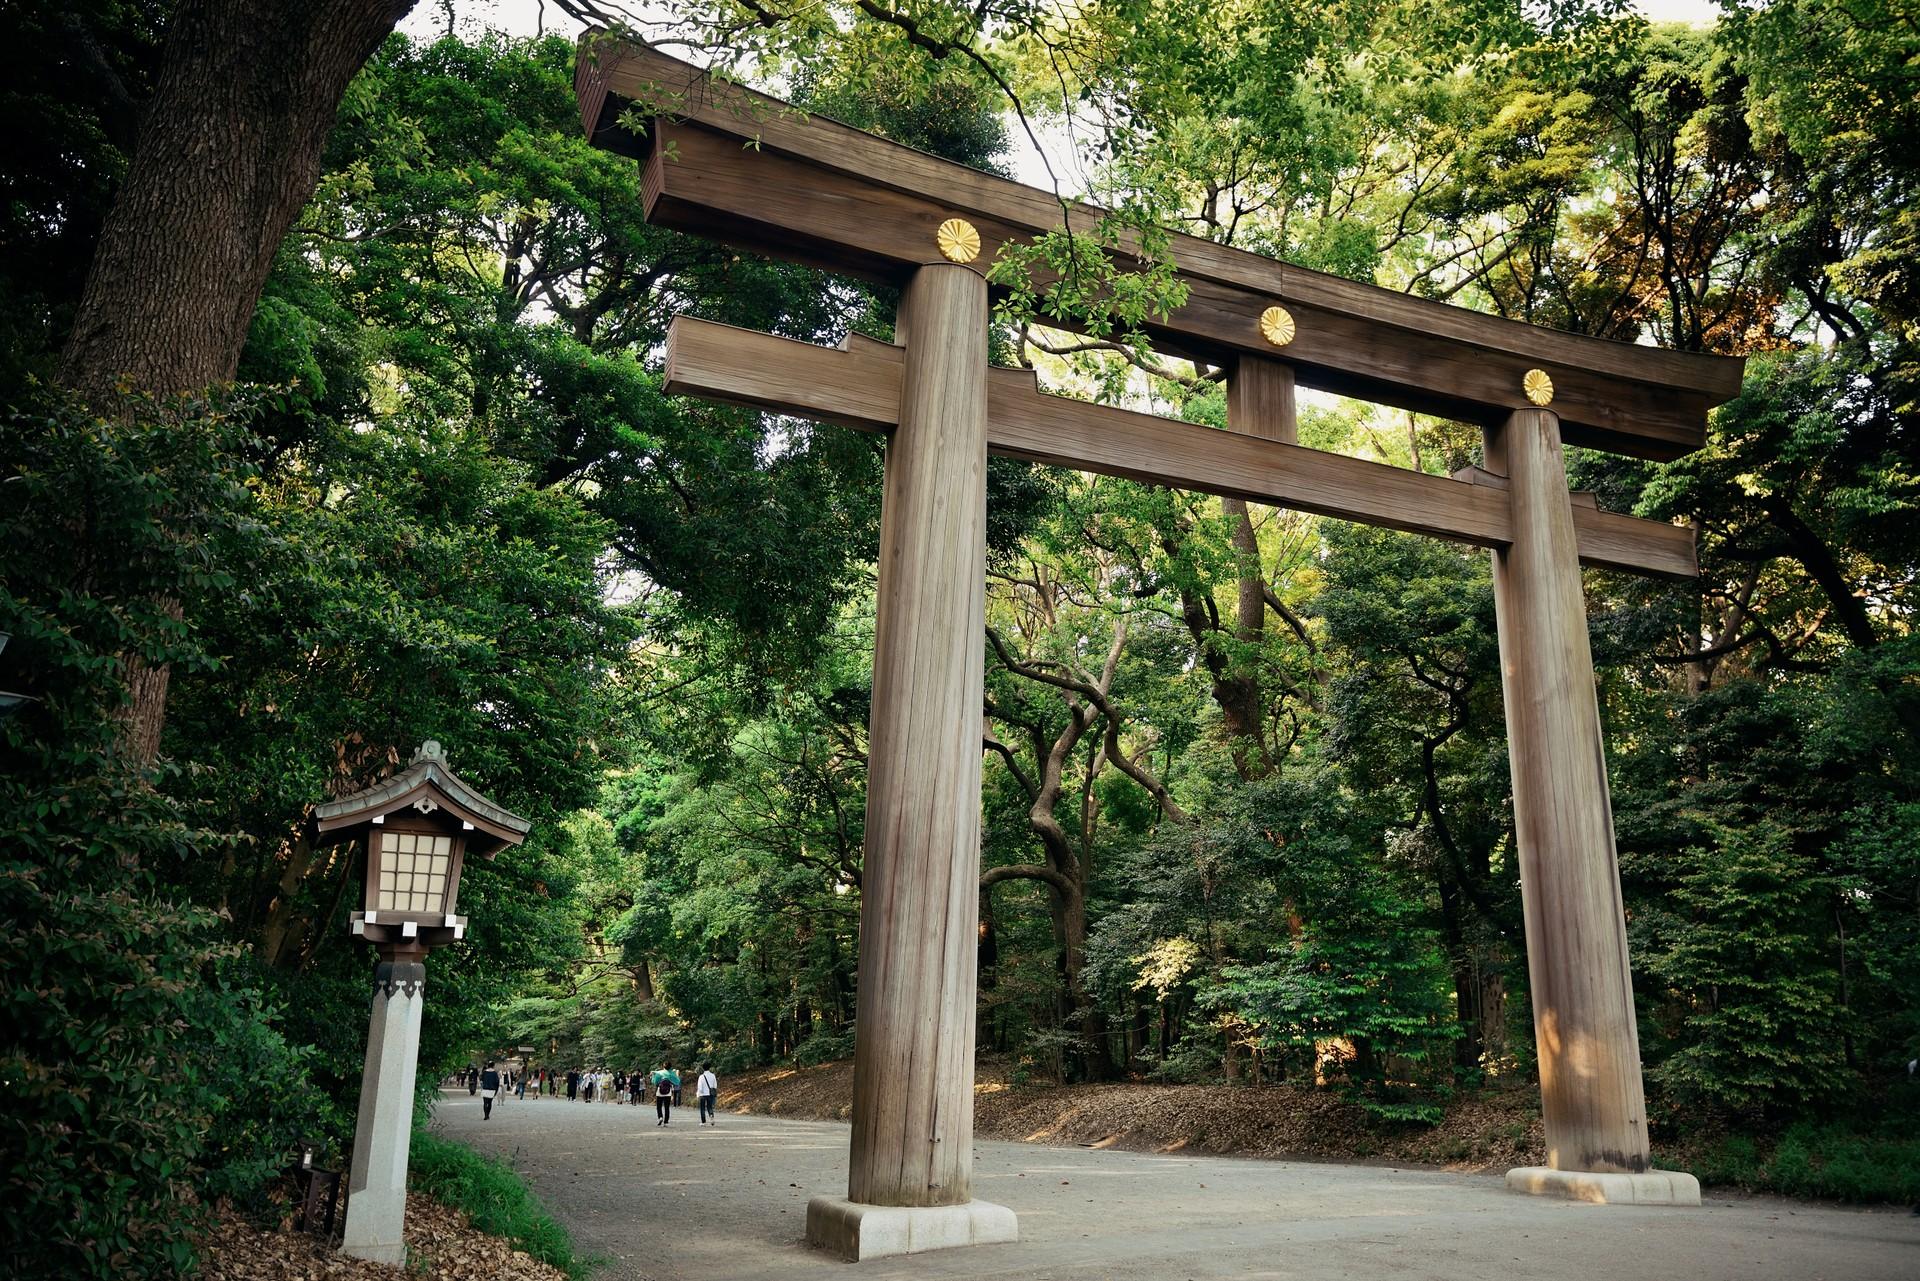 The Meiji Shrine in Tokyo's Yoyogi park